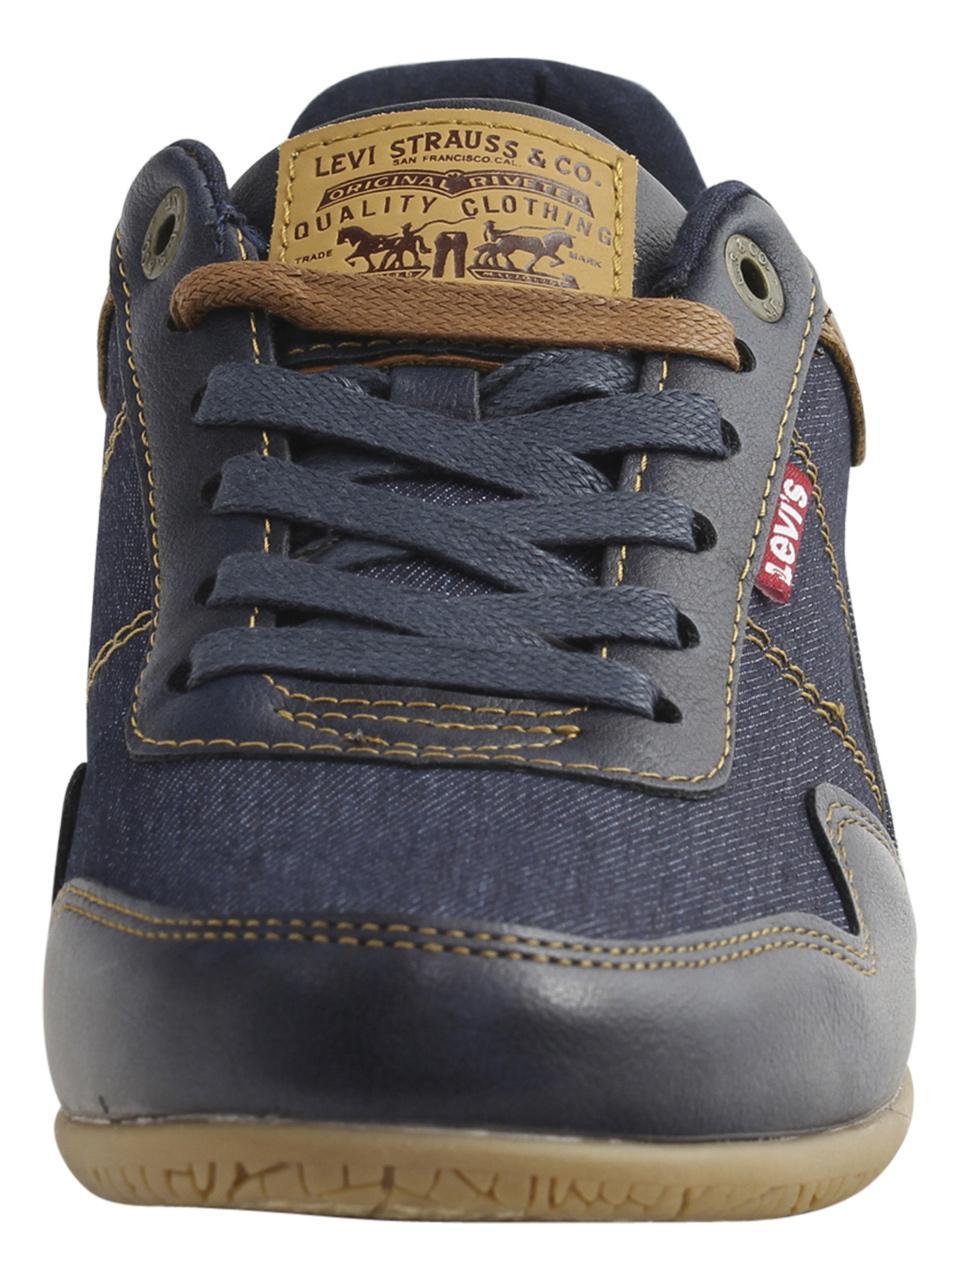 40a738266958 Levi s Men s Rio-Nappa-UL-Denim Levis Sneakers Shoes by Levi s